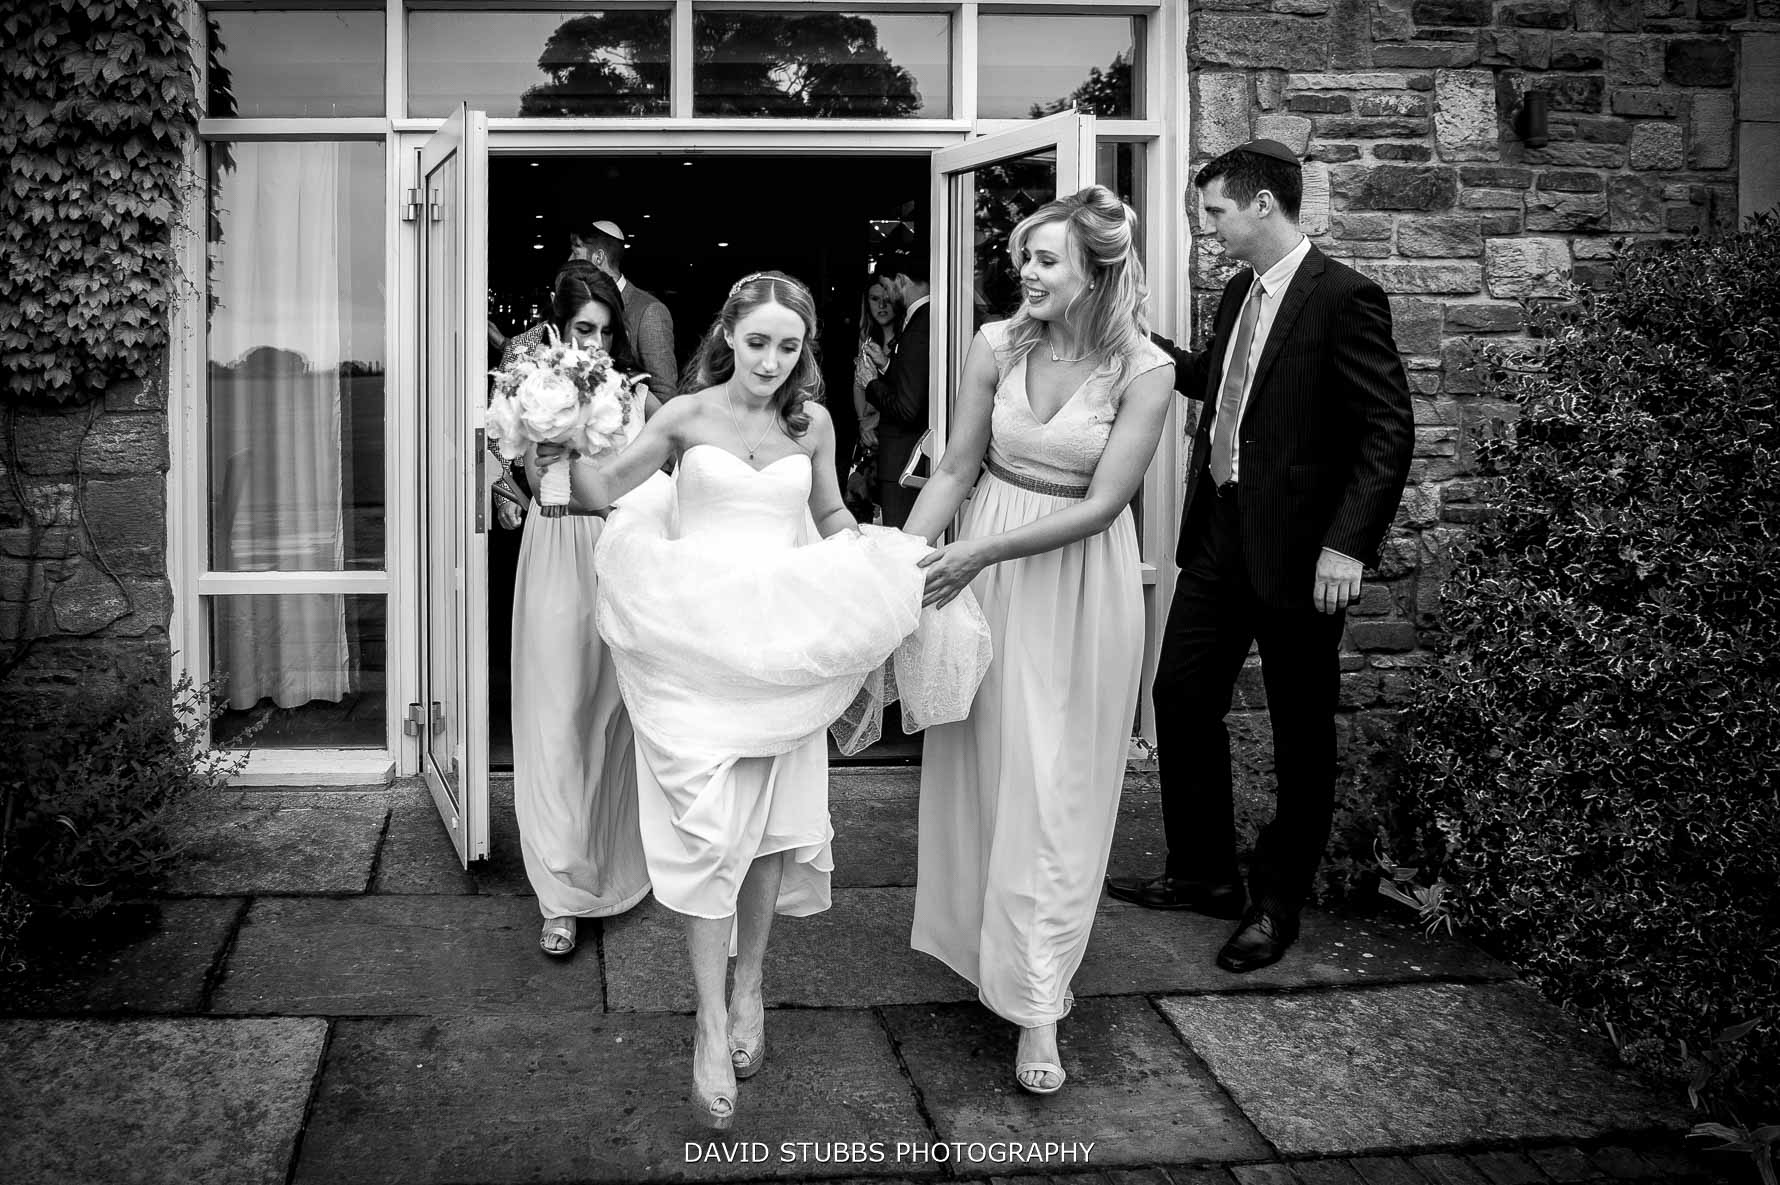 bride walking out showing dress